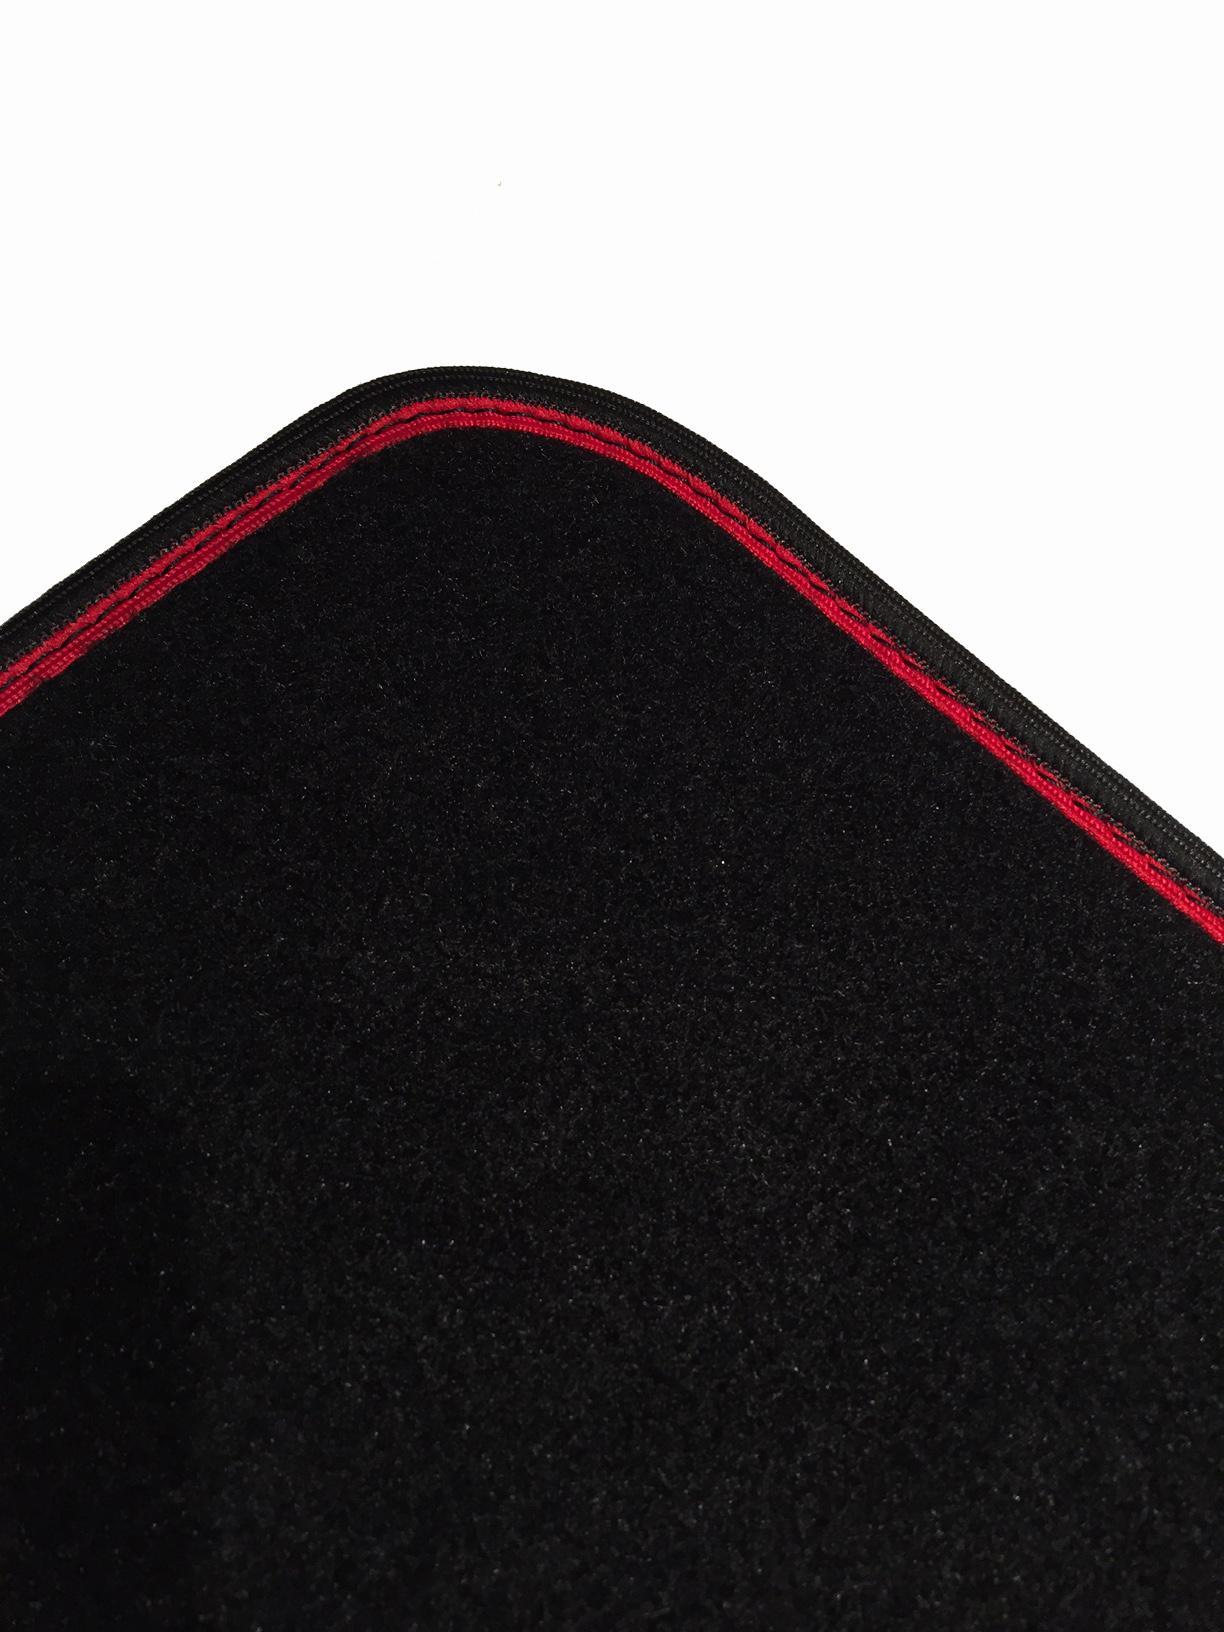 Autofußmatten DBS 01765761 Bewertung